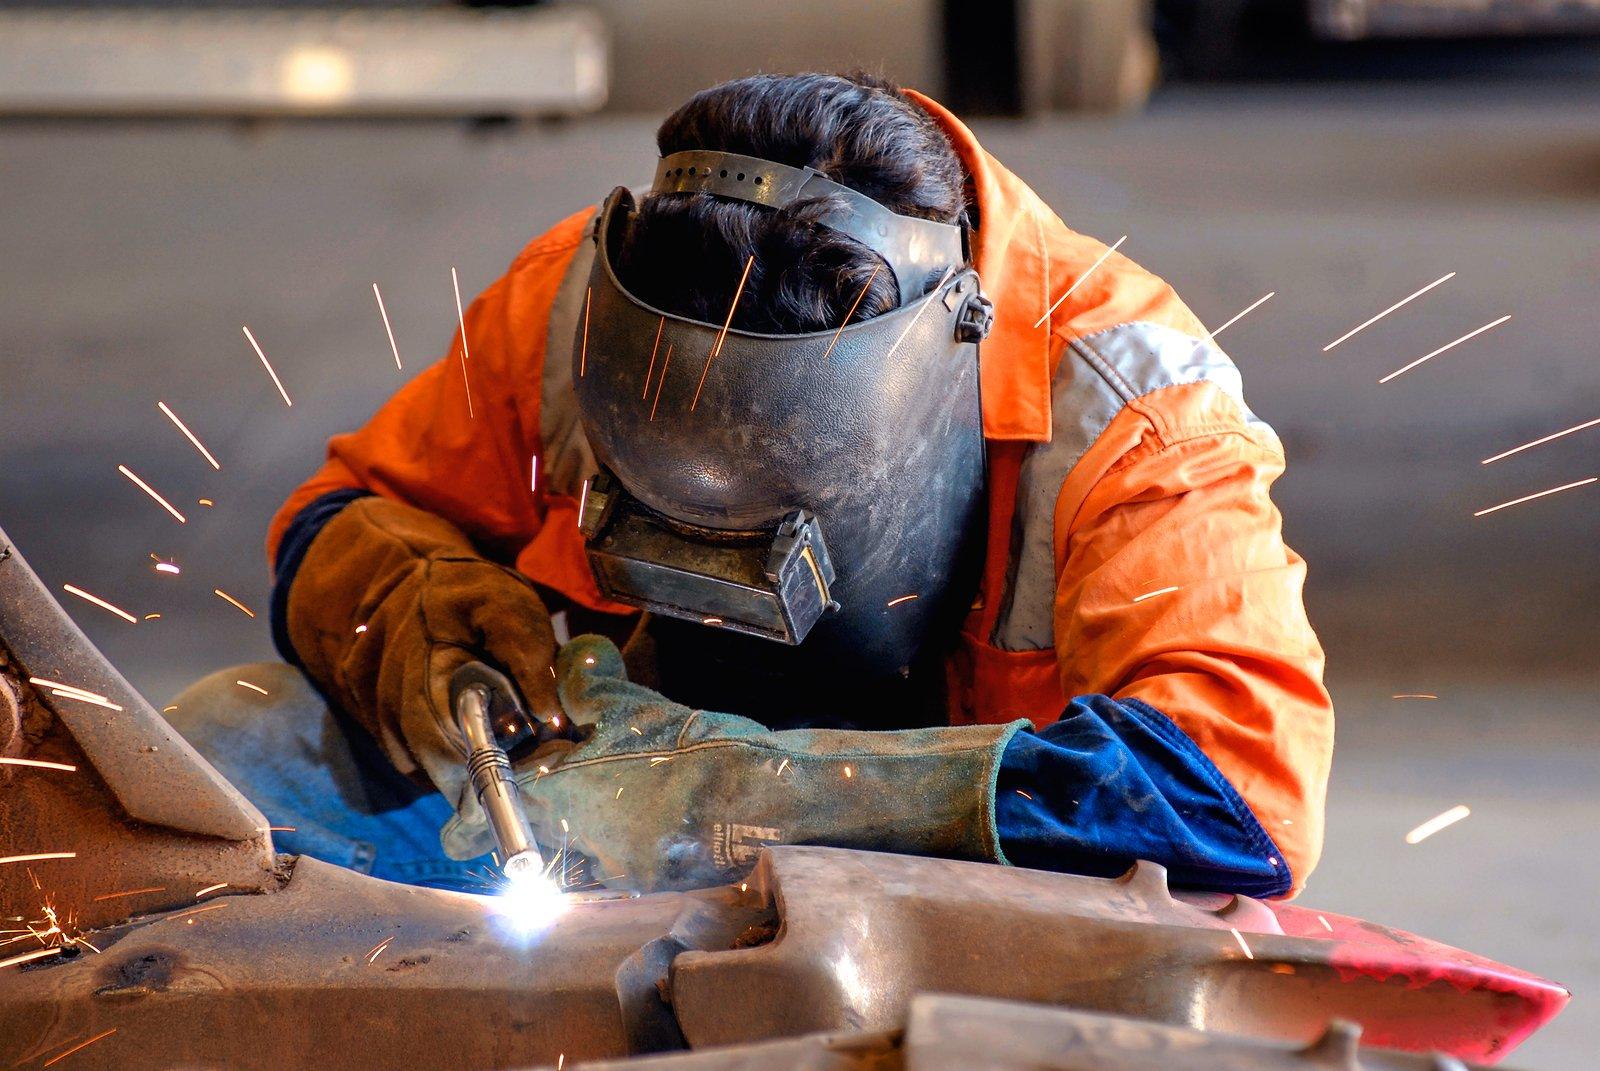 Panasonic Welding Systems to revolutionize Welding industry in India